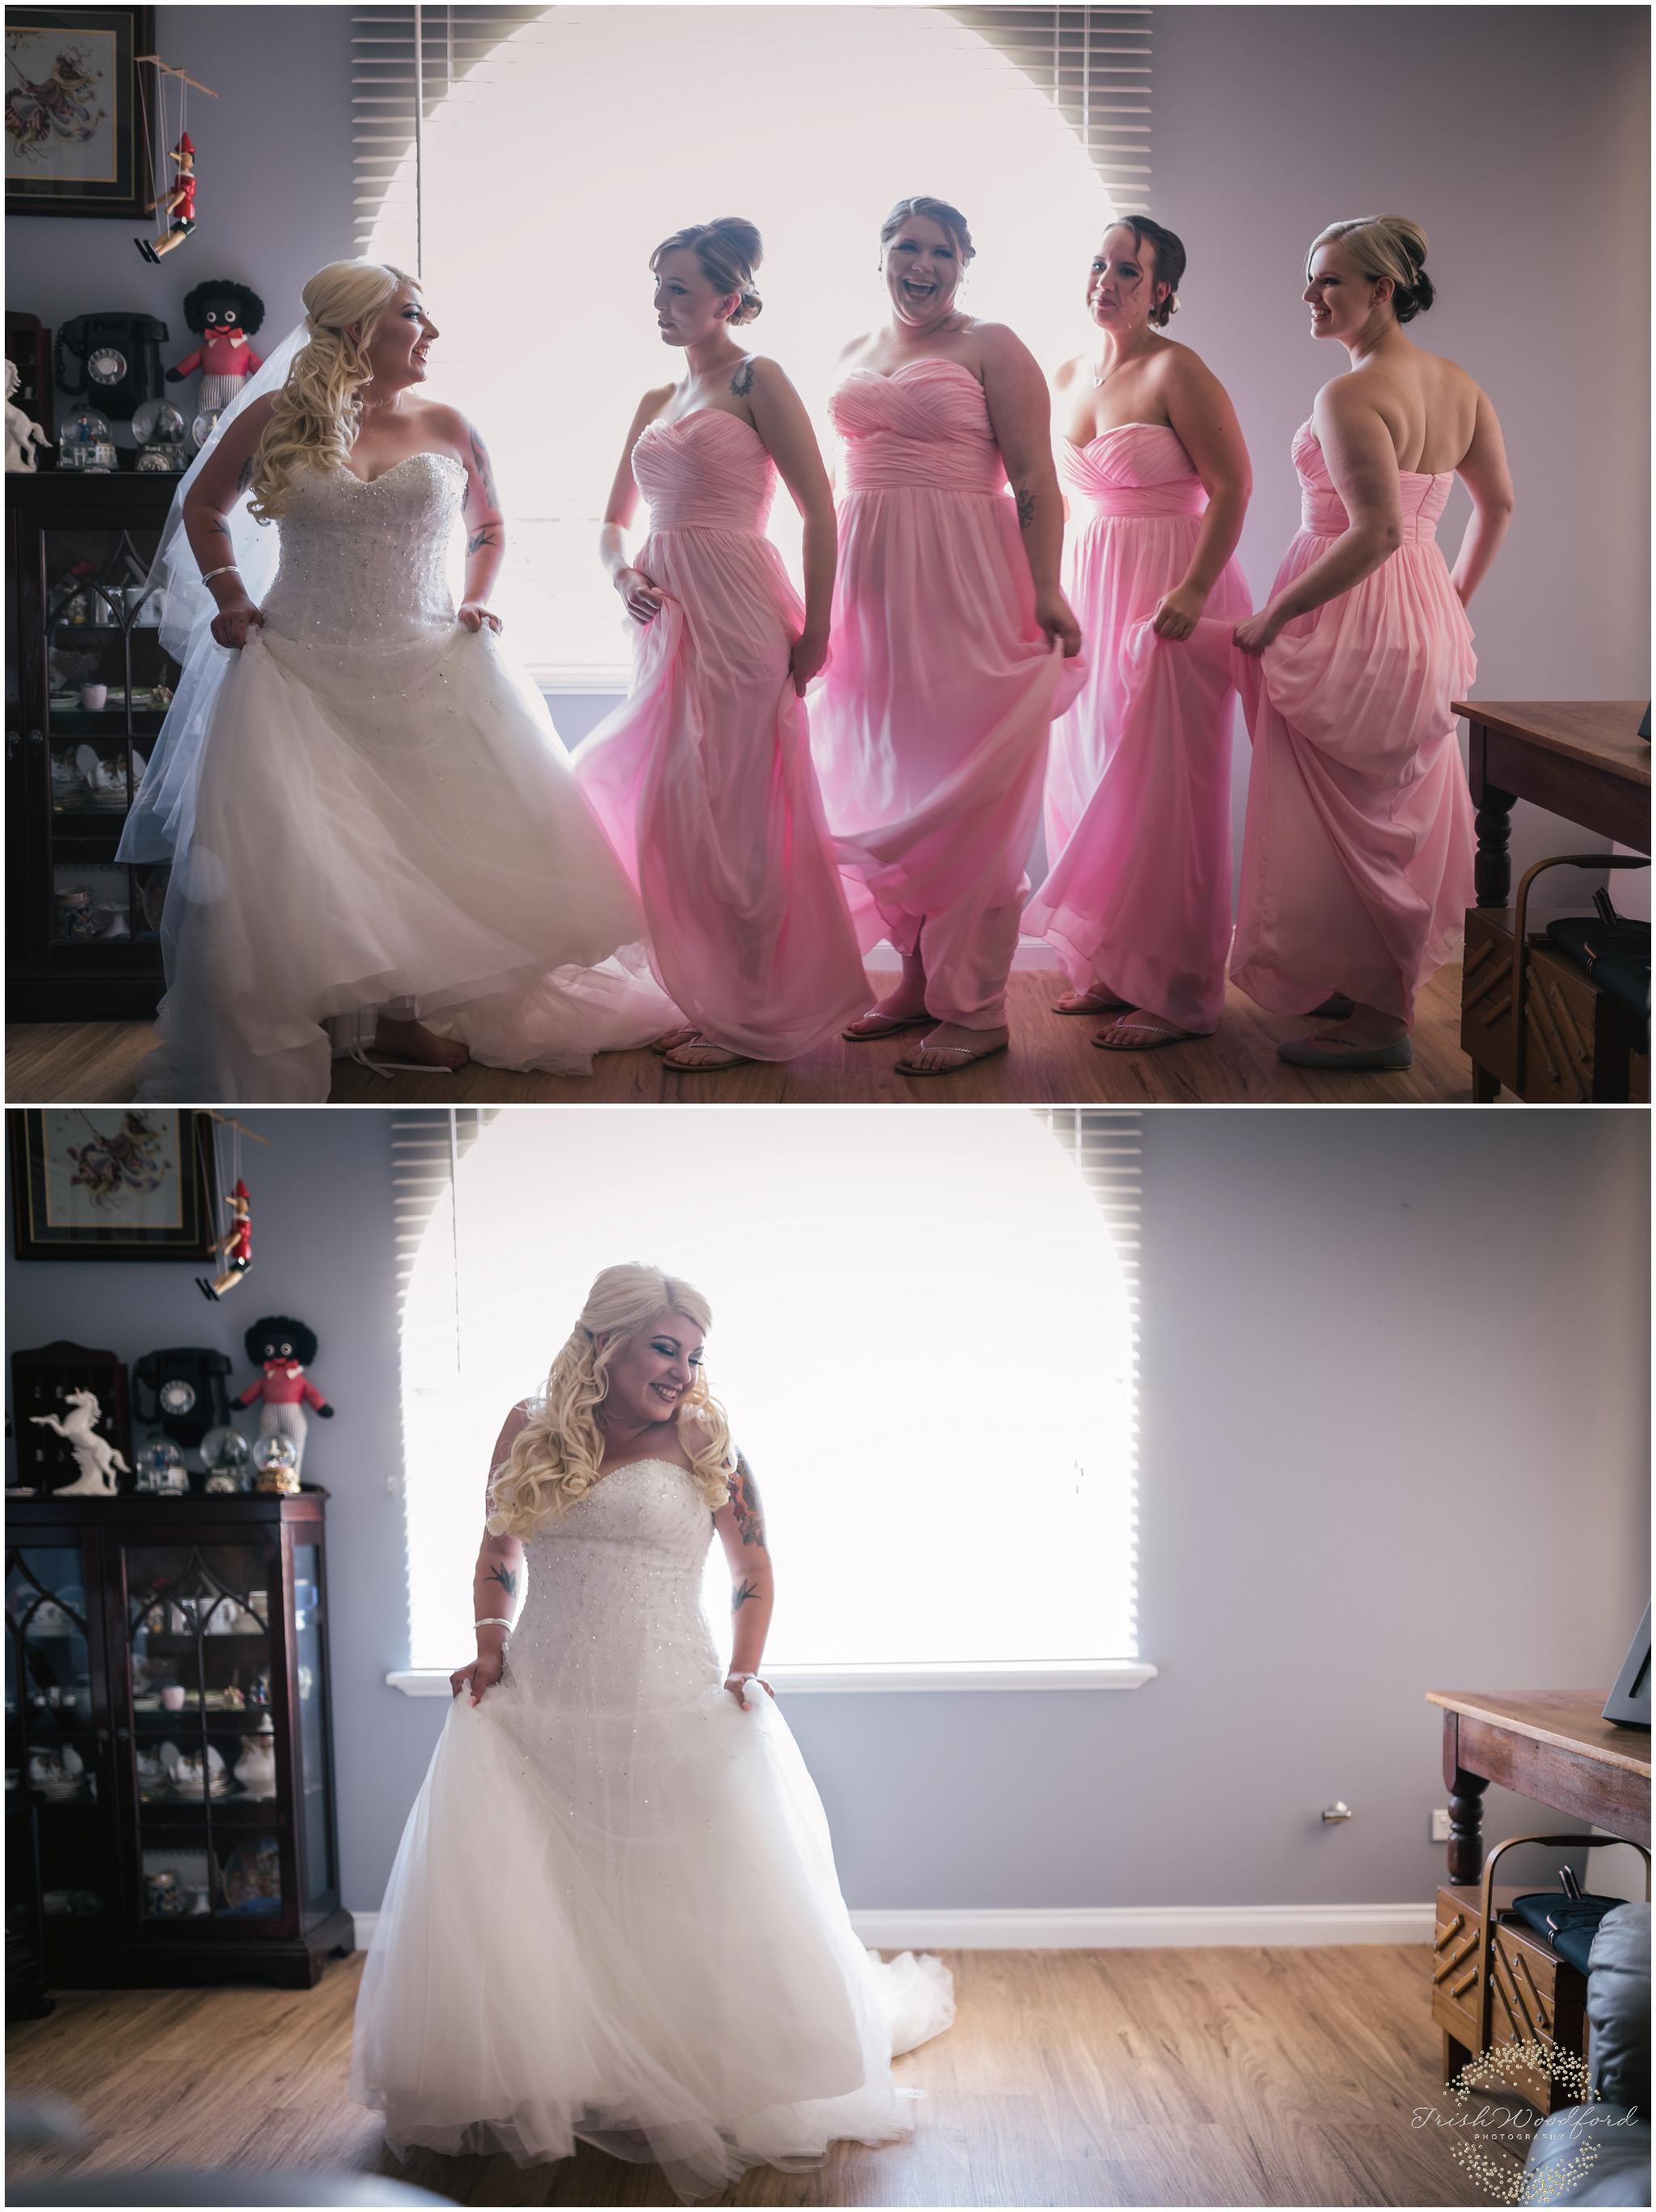 Bride & Bridesmaids Getting Ready Rockingham Wedding